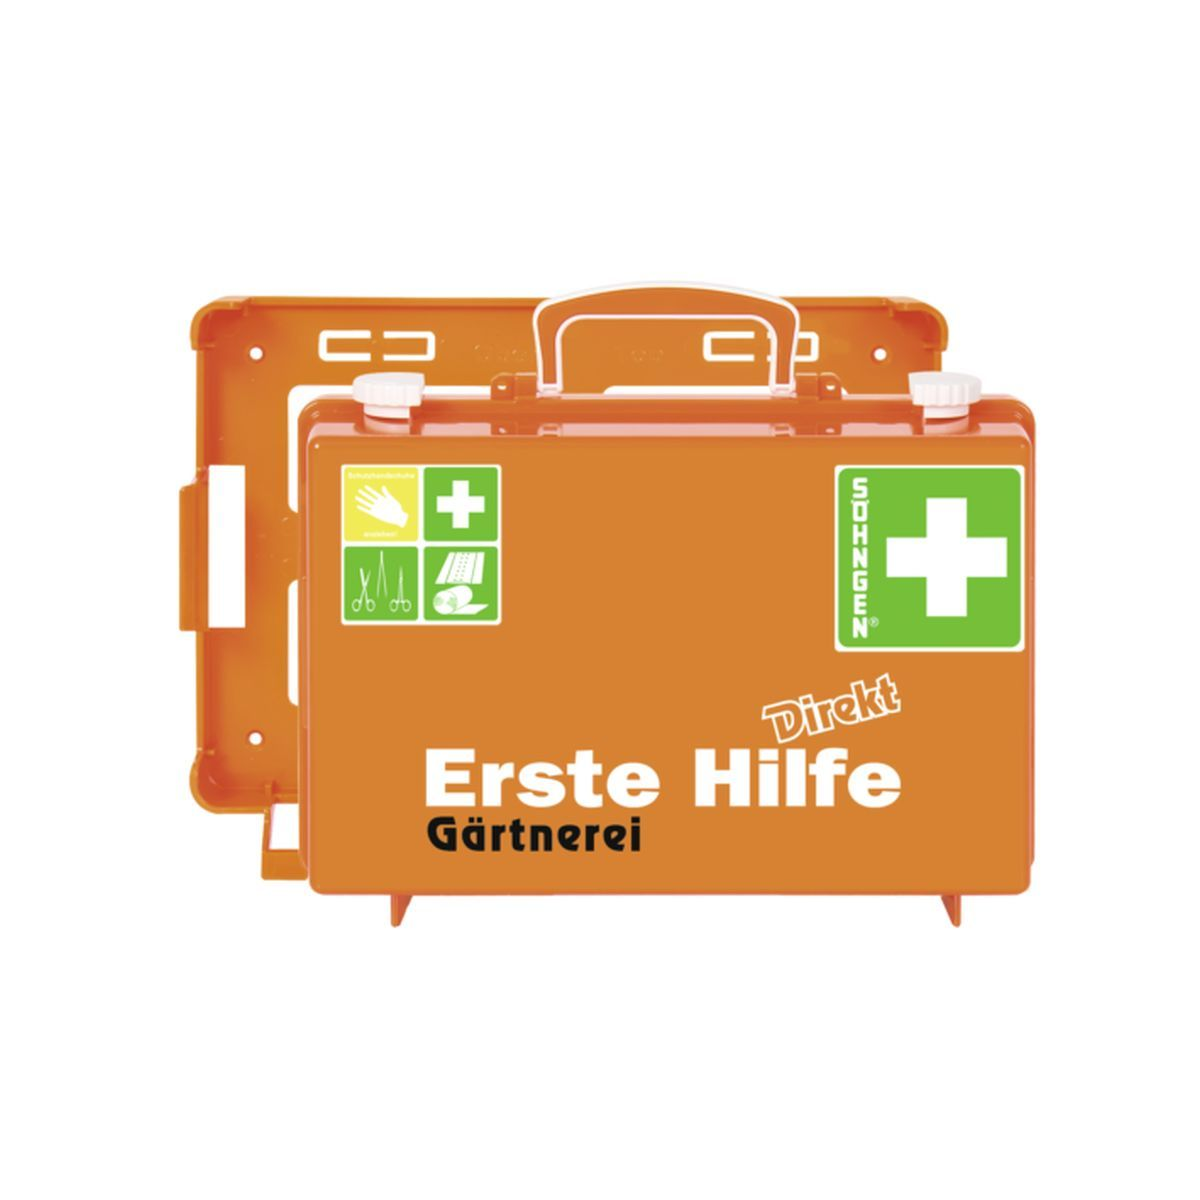 Erste Hilfe Koffer DIN 13157 DIREKT, Gärtnerei